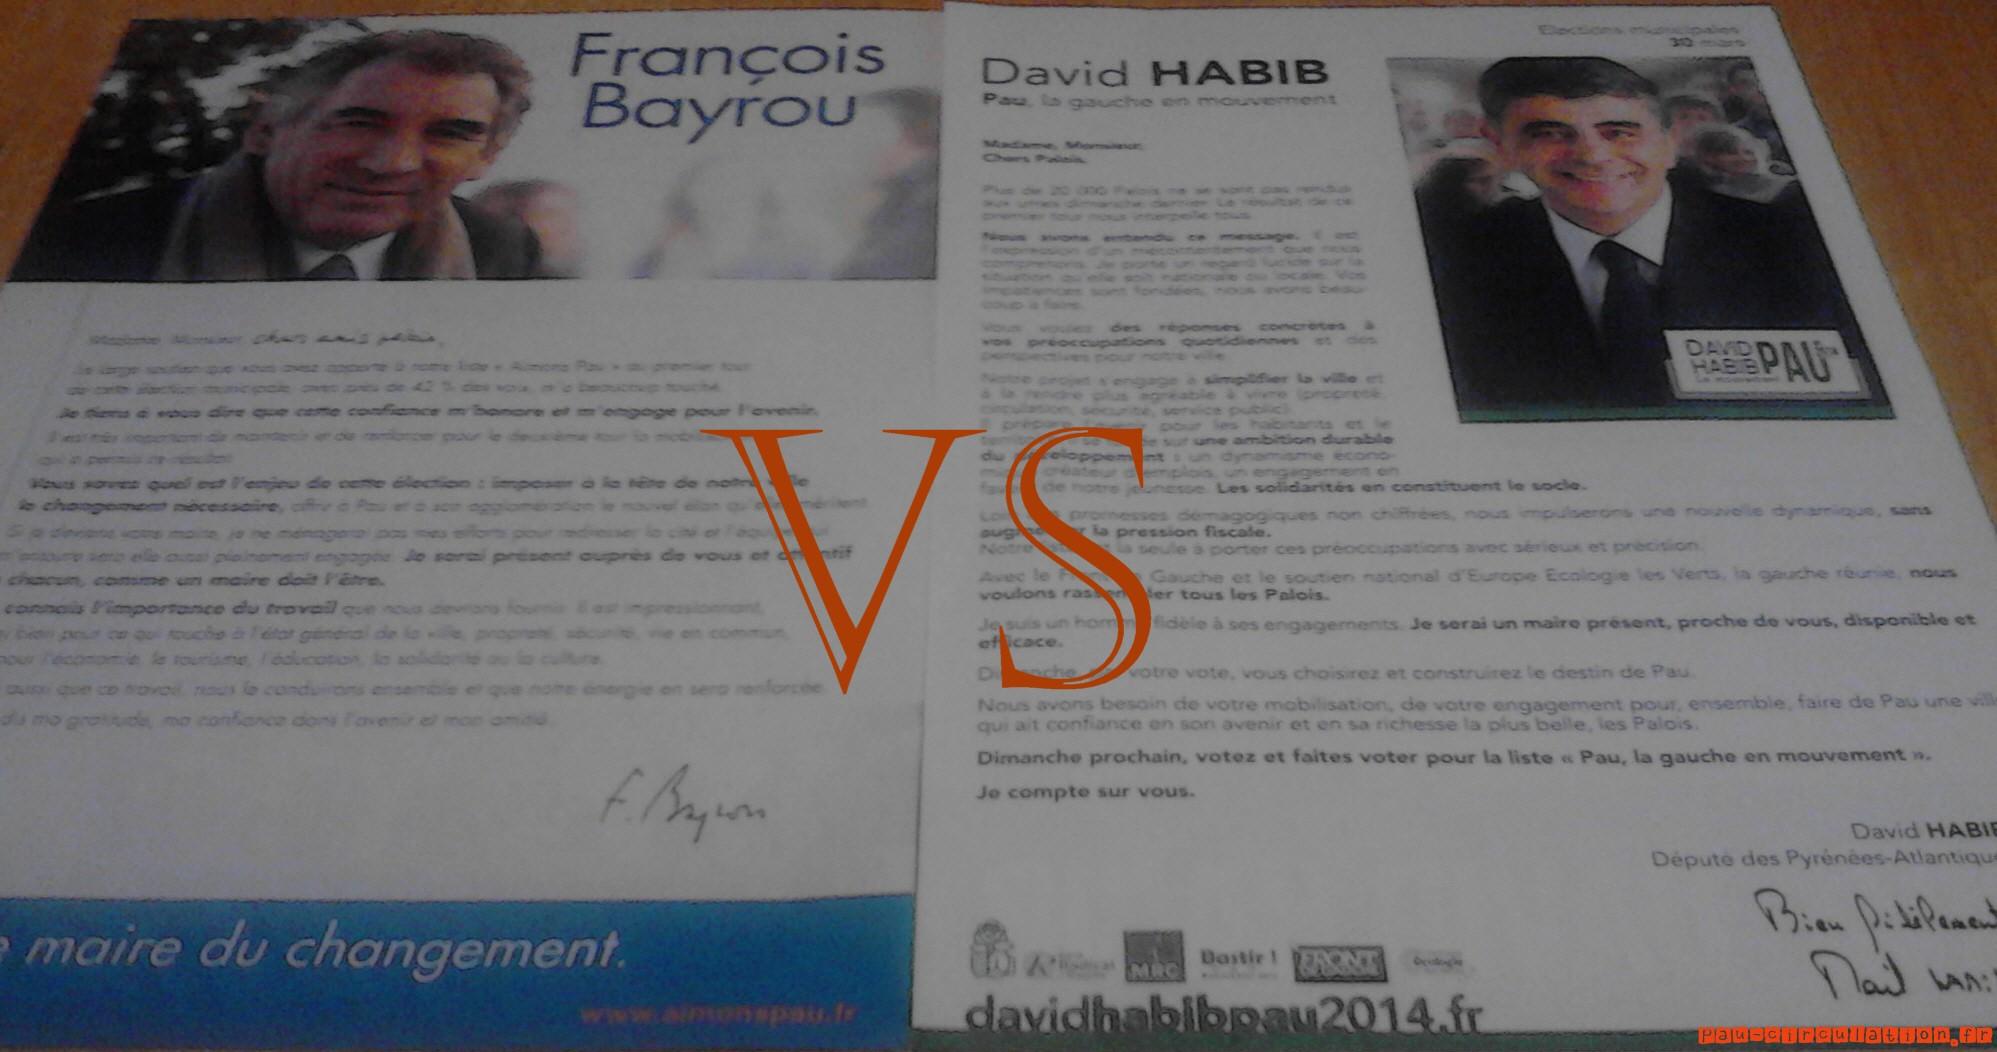 Bayrou VS Habib (2ème tour)